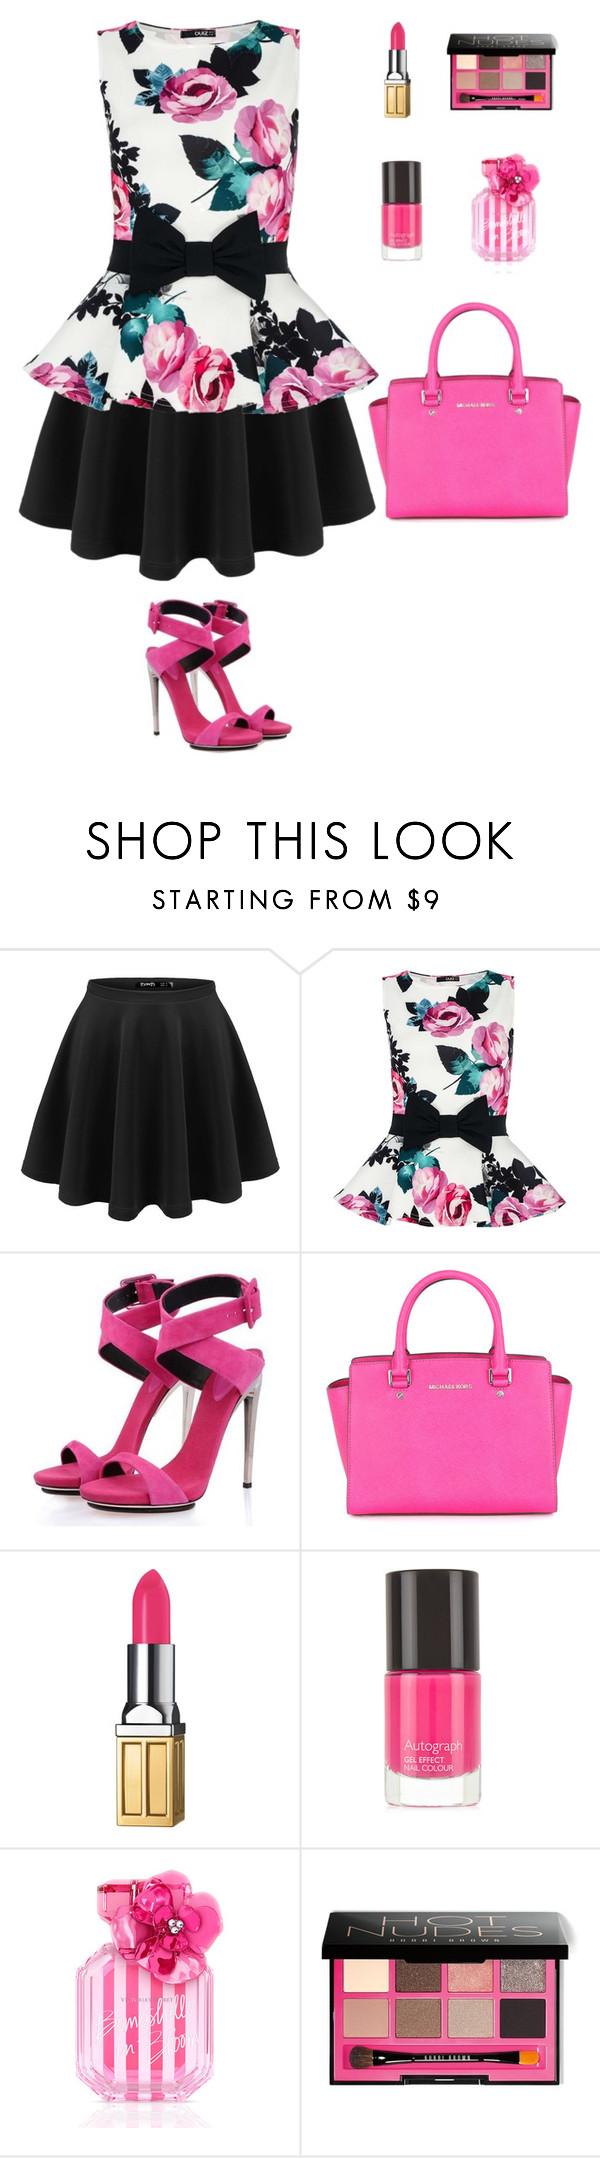 """#35"" by nada-shraim ❤ liked on Polyvore featuring Dorothy Perkins, Posh Girl, Michael Kors, Elizabeth Arden, M&S, Victoria's Secret, Bobbi Brown Cosmetics, women's clothing, women's fashion and women"